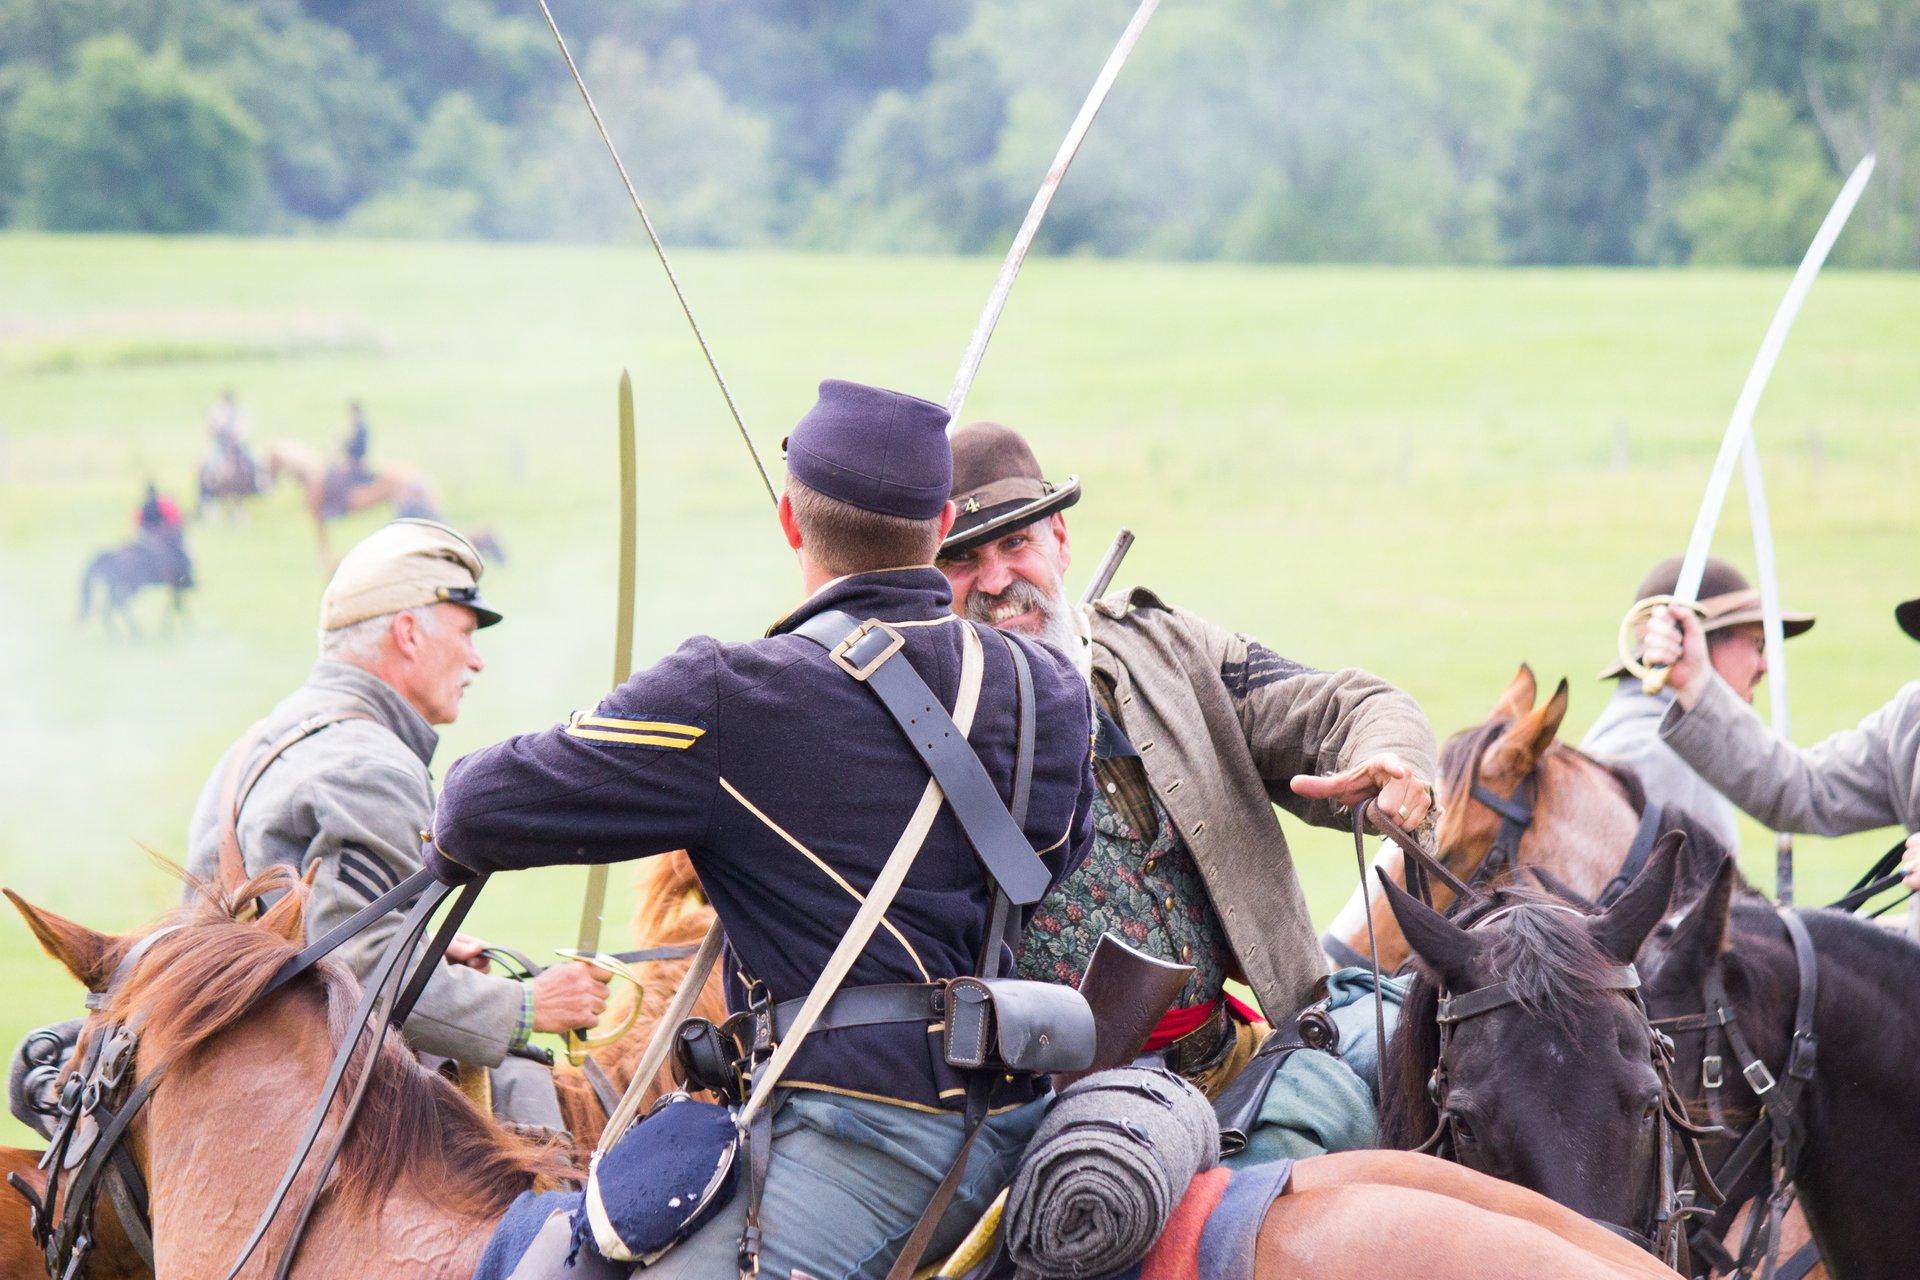 Gettysburg Civil War Battle Reenactment in Pennsylvania 2020 - Best Time